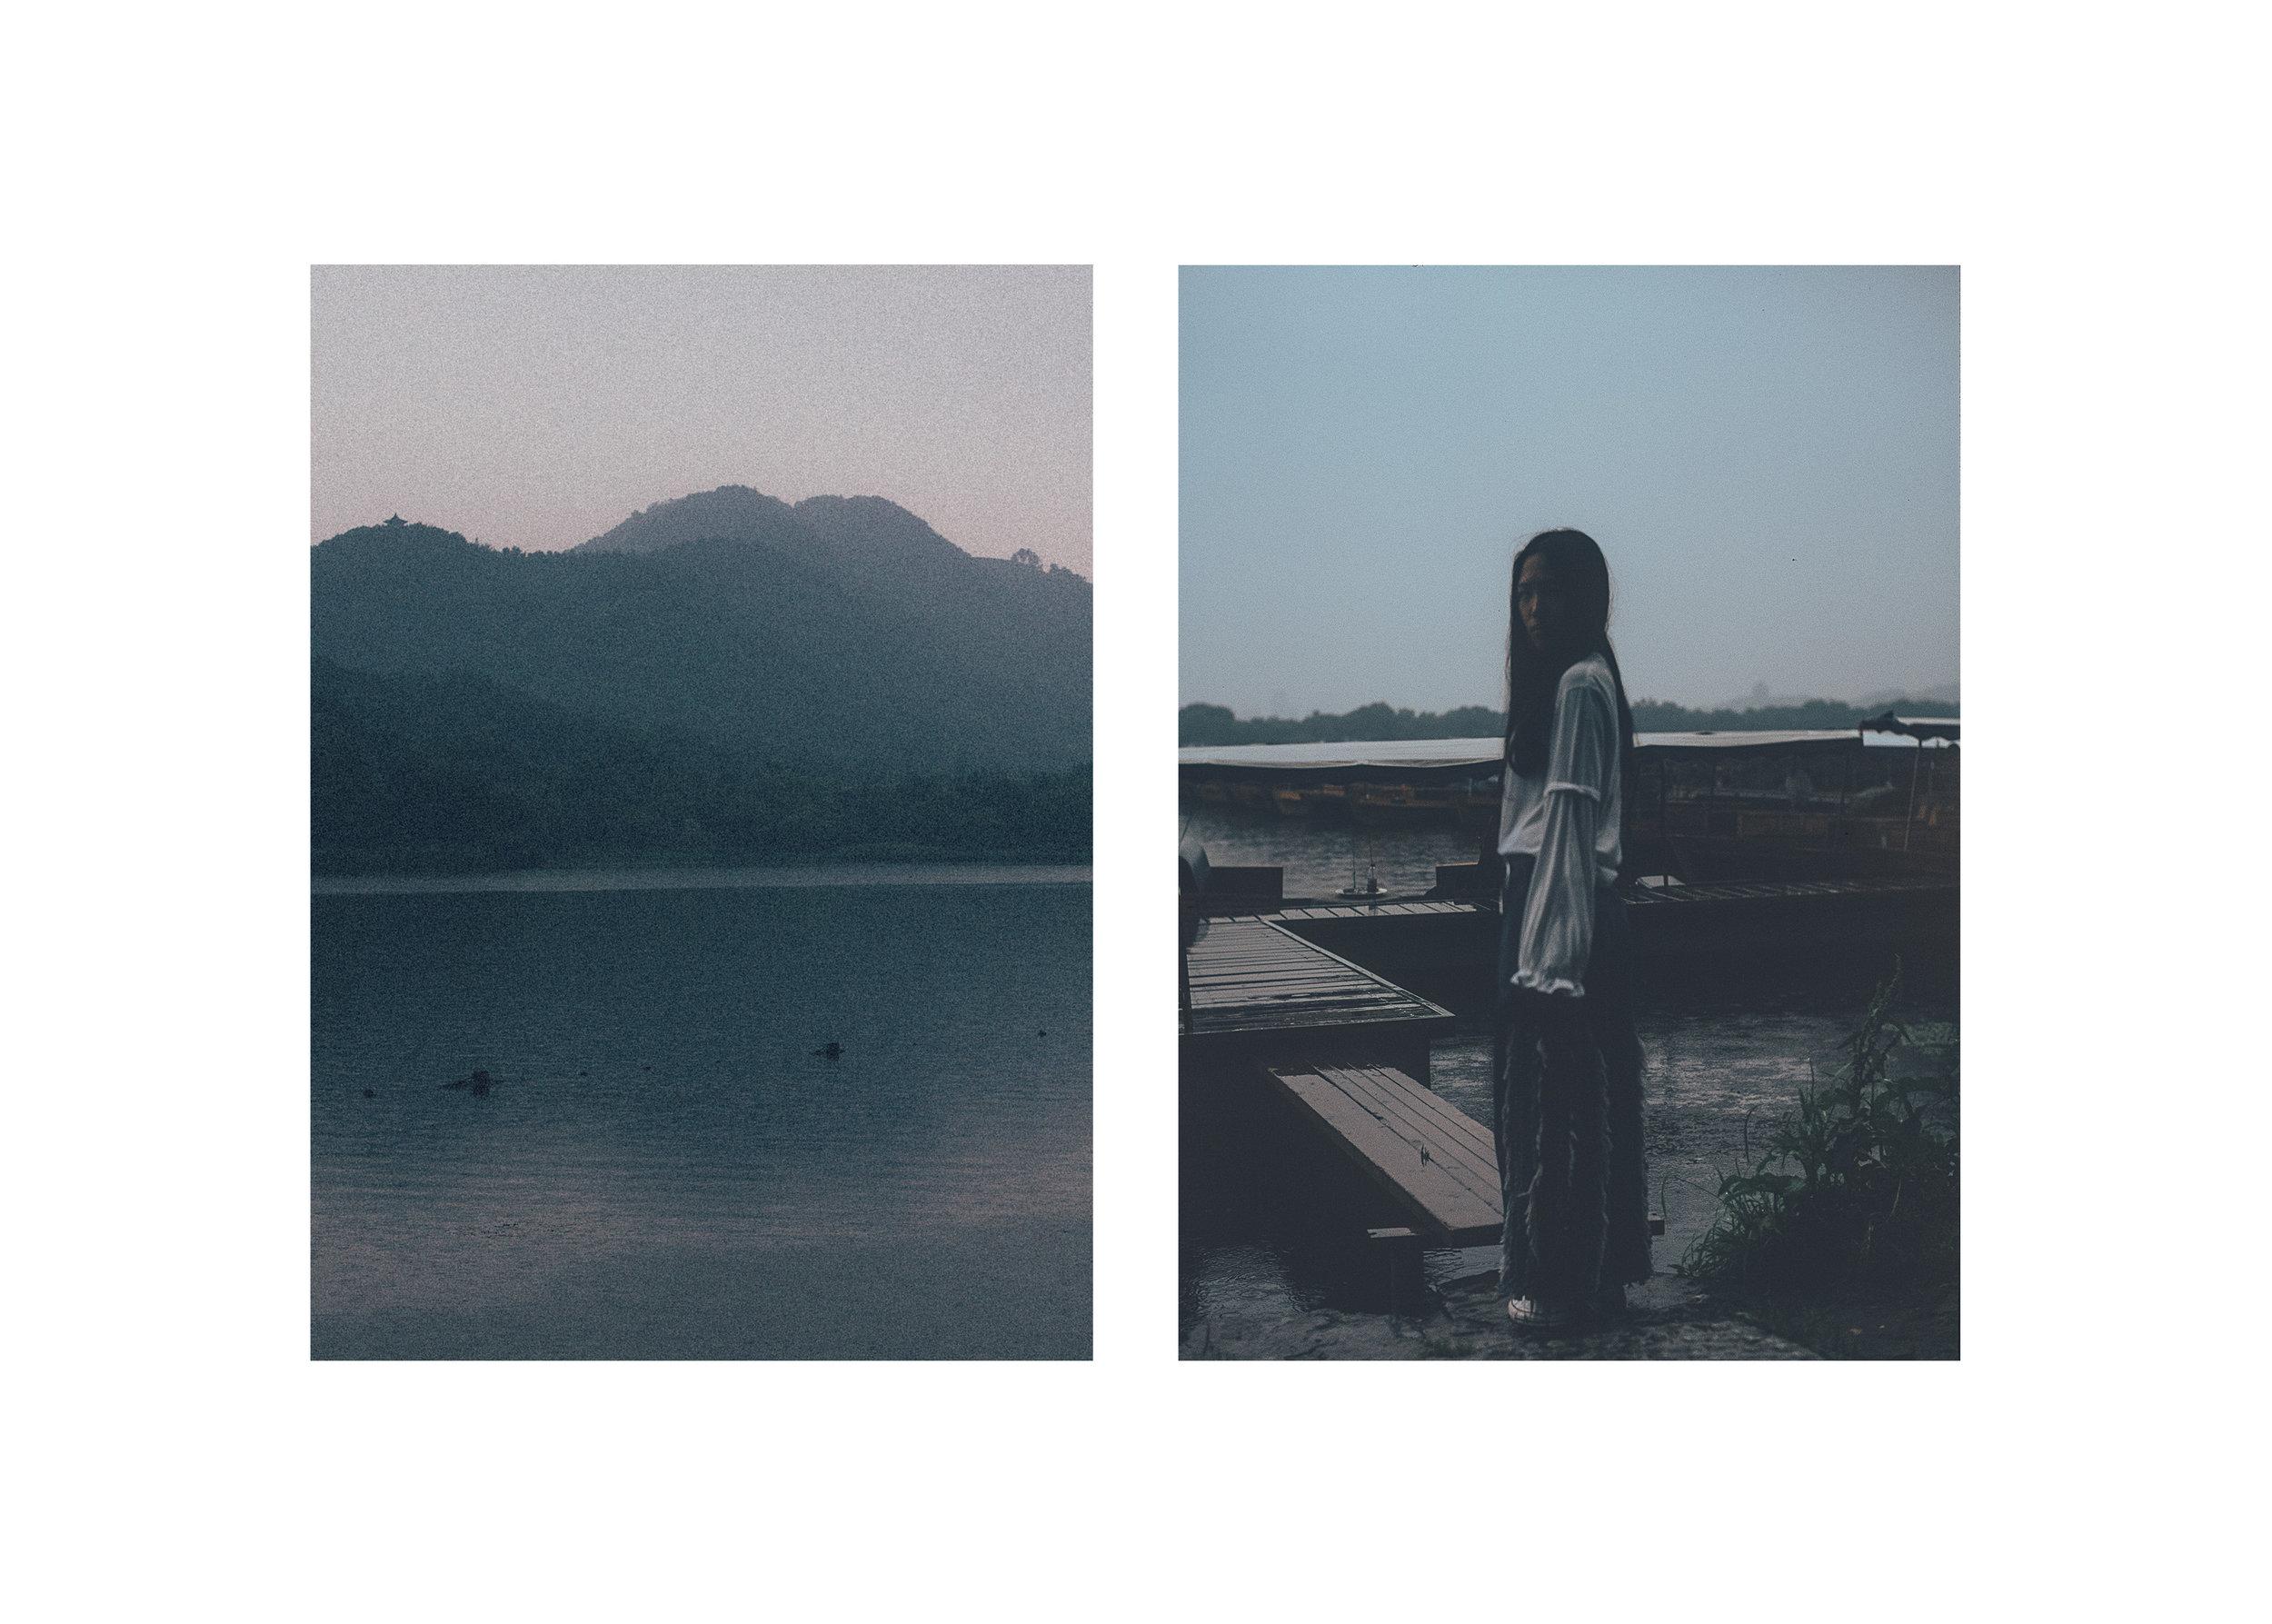 pascale-arnaud-xiaotong-2016-photography-of-china-4.jpg